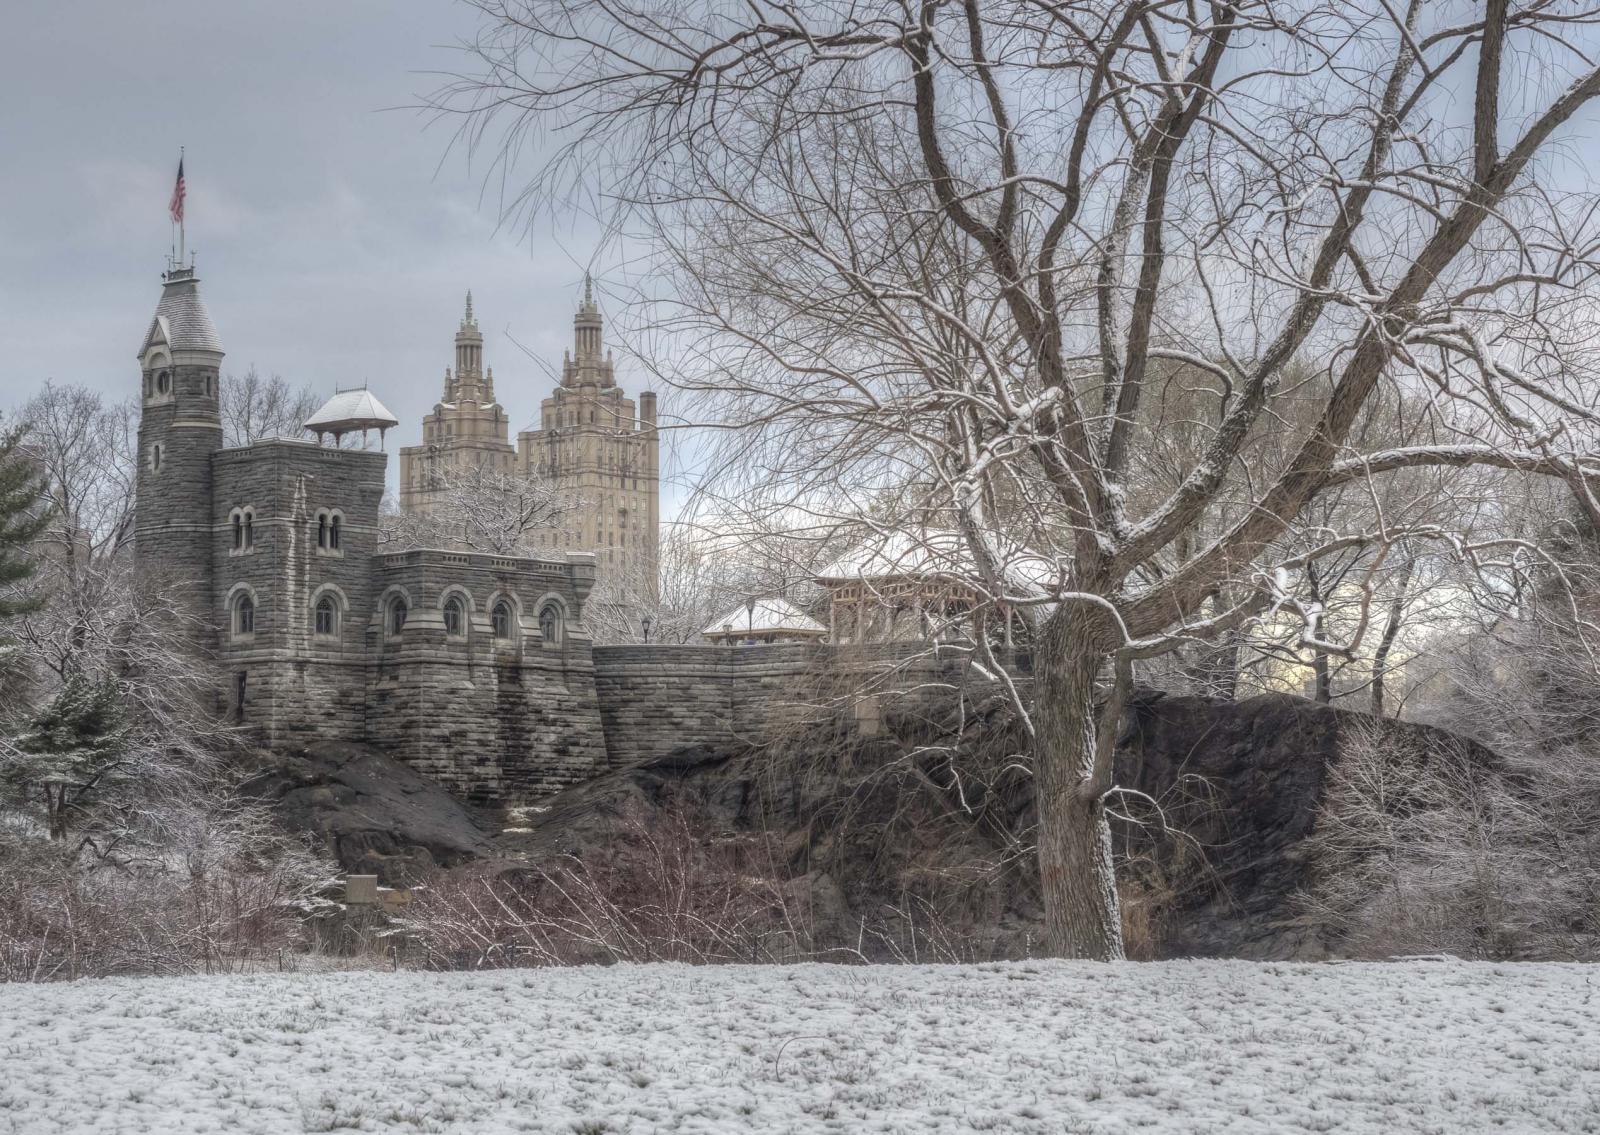 Central Park Belvedere Castle